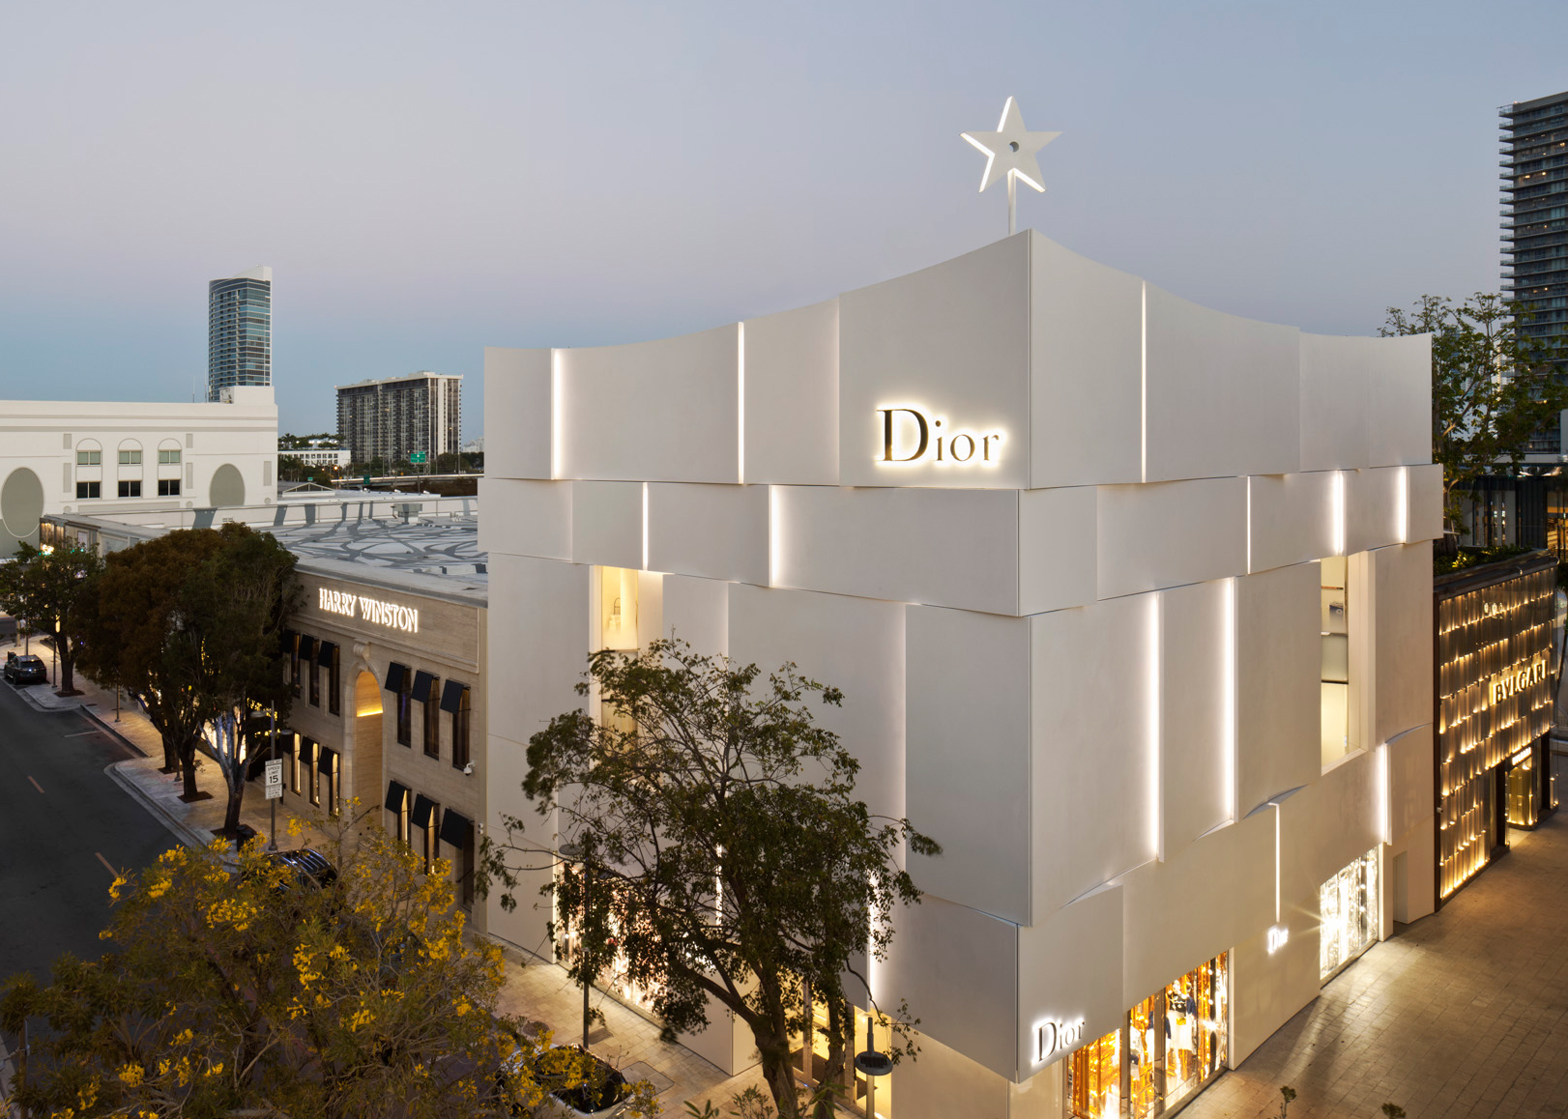 Miami Dior Boutique By Barbarito Bancel Has Pleats